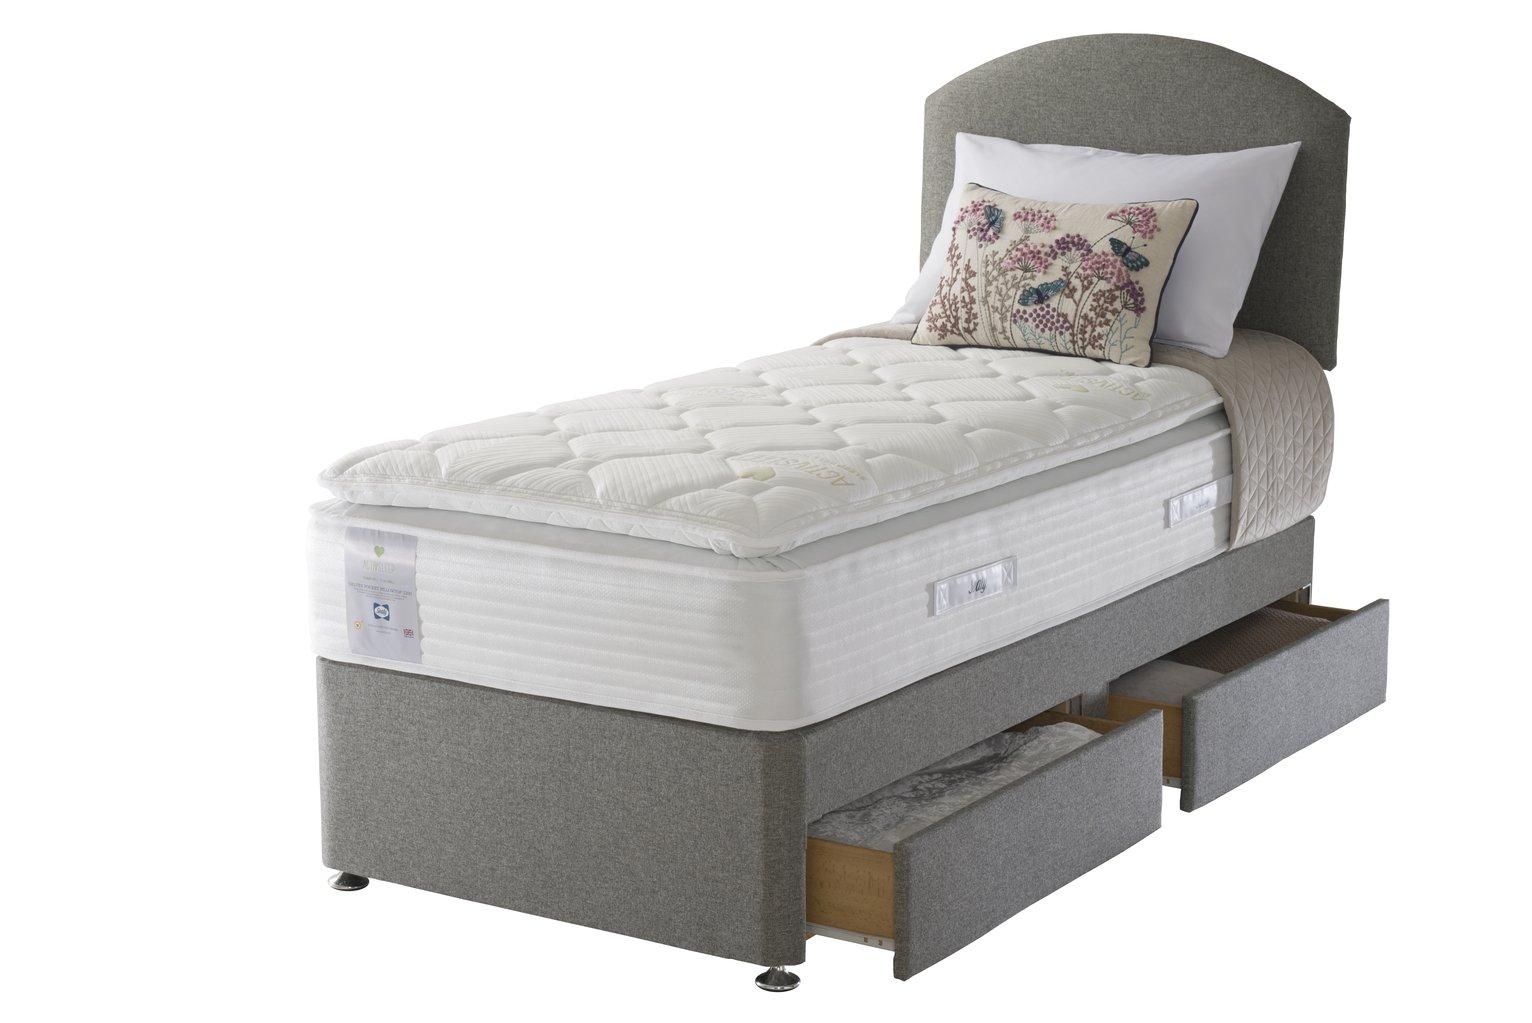 Sealy Activ 2200 Geltex Pillowtop 2 Drawer Single Divan